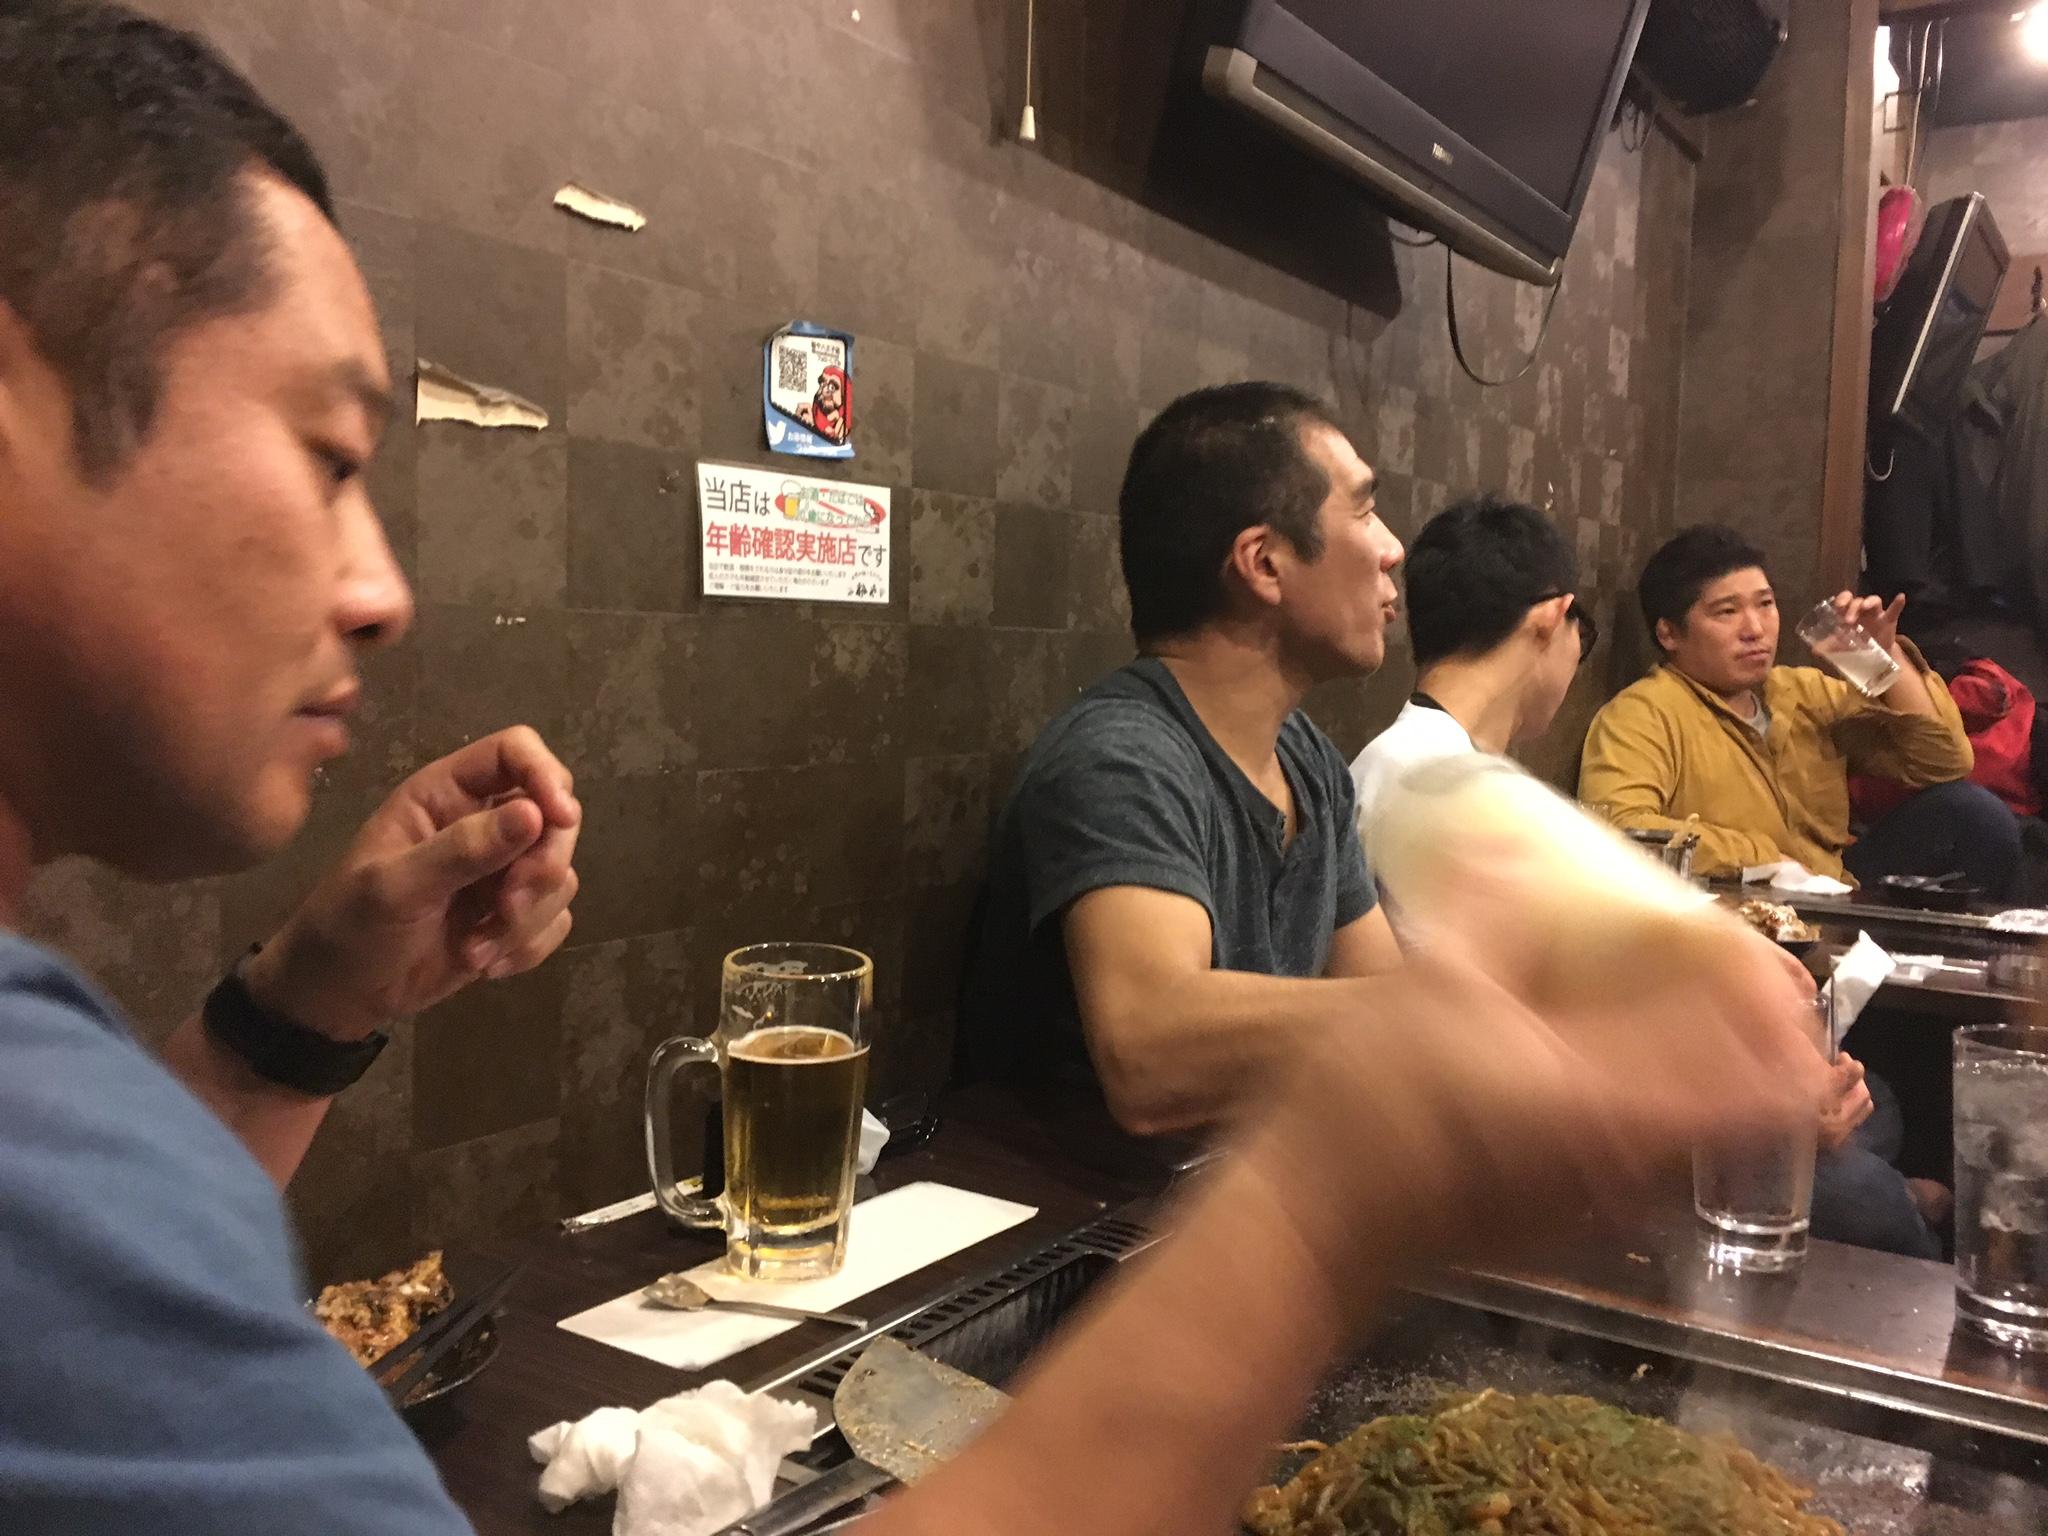 『炎の乱取り祭り』日本工学院八王子専門学校へ③忘年会編。